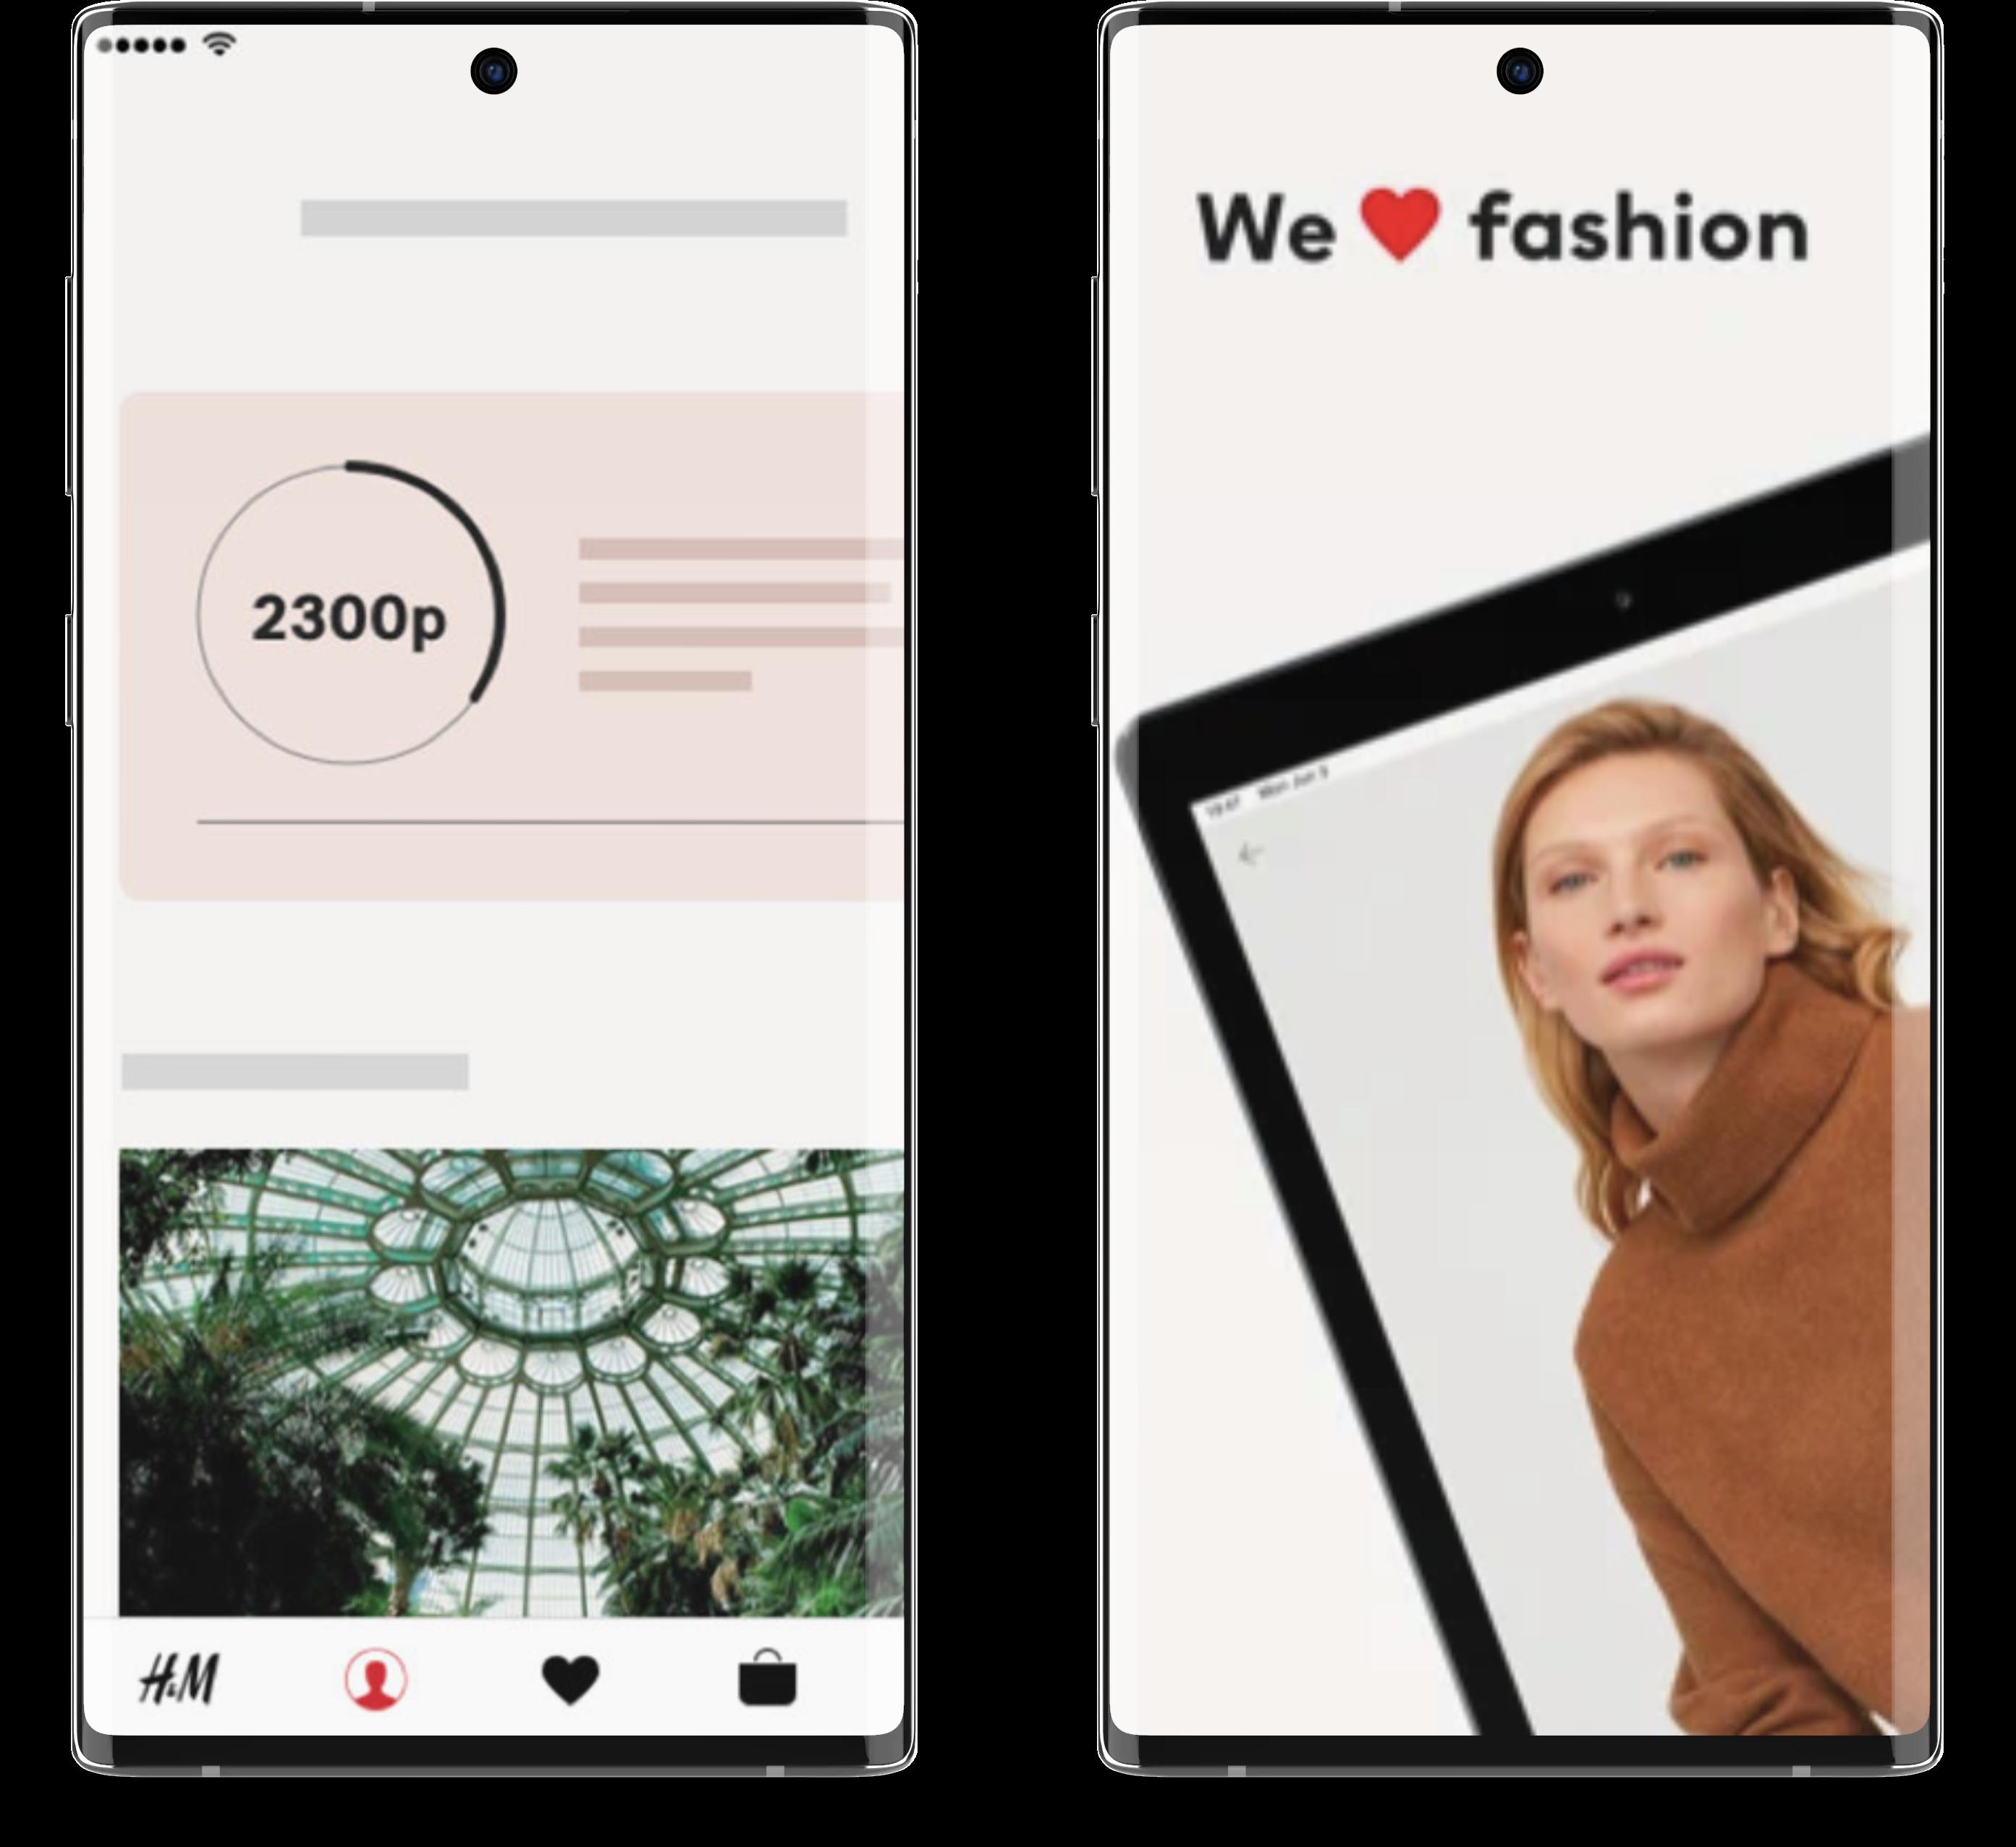 H&M loyalty program for mobile apps